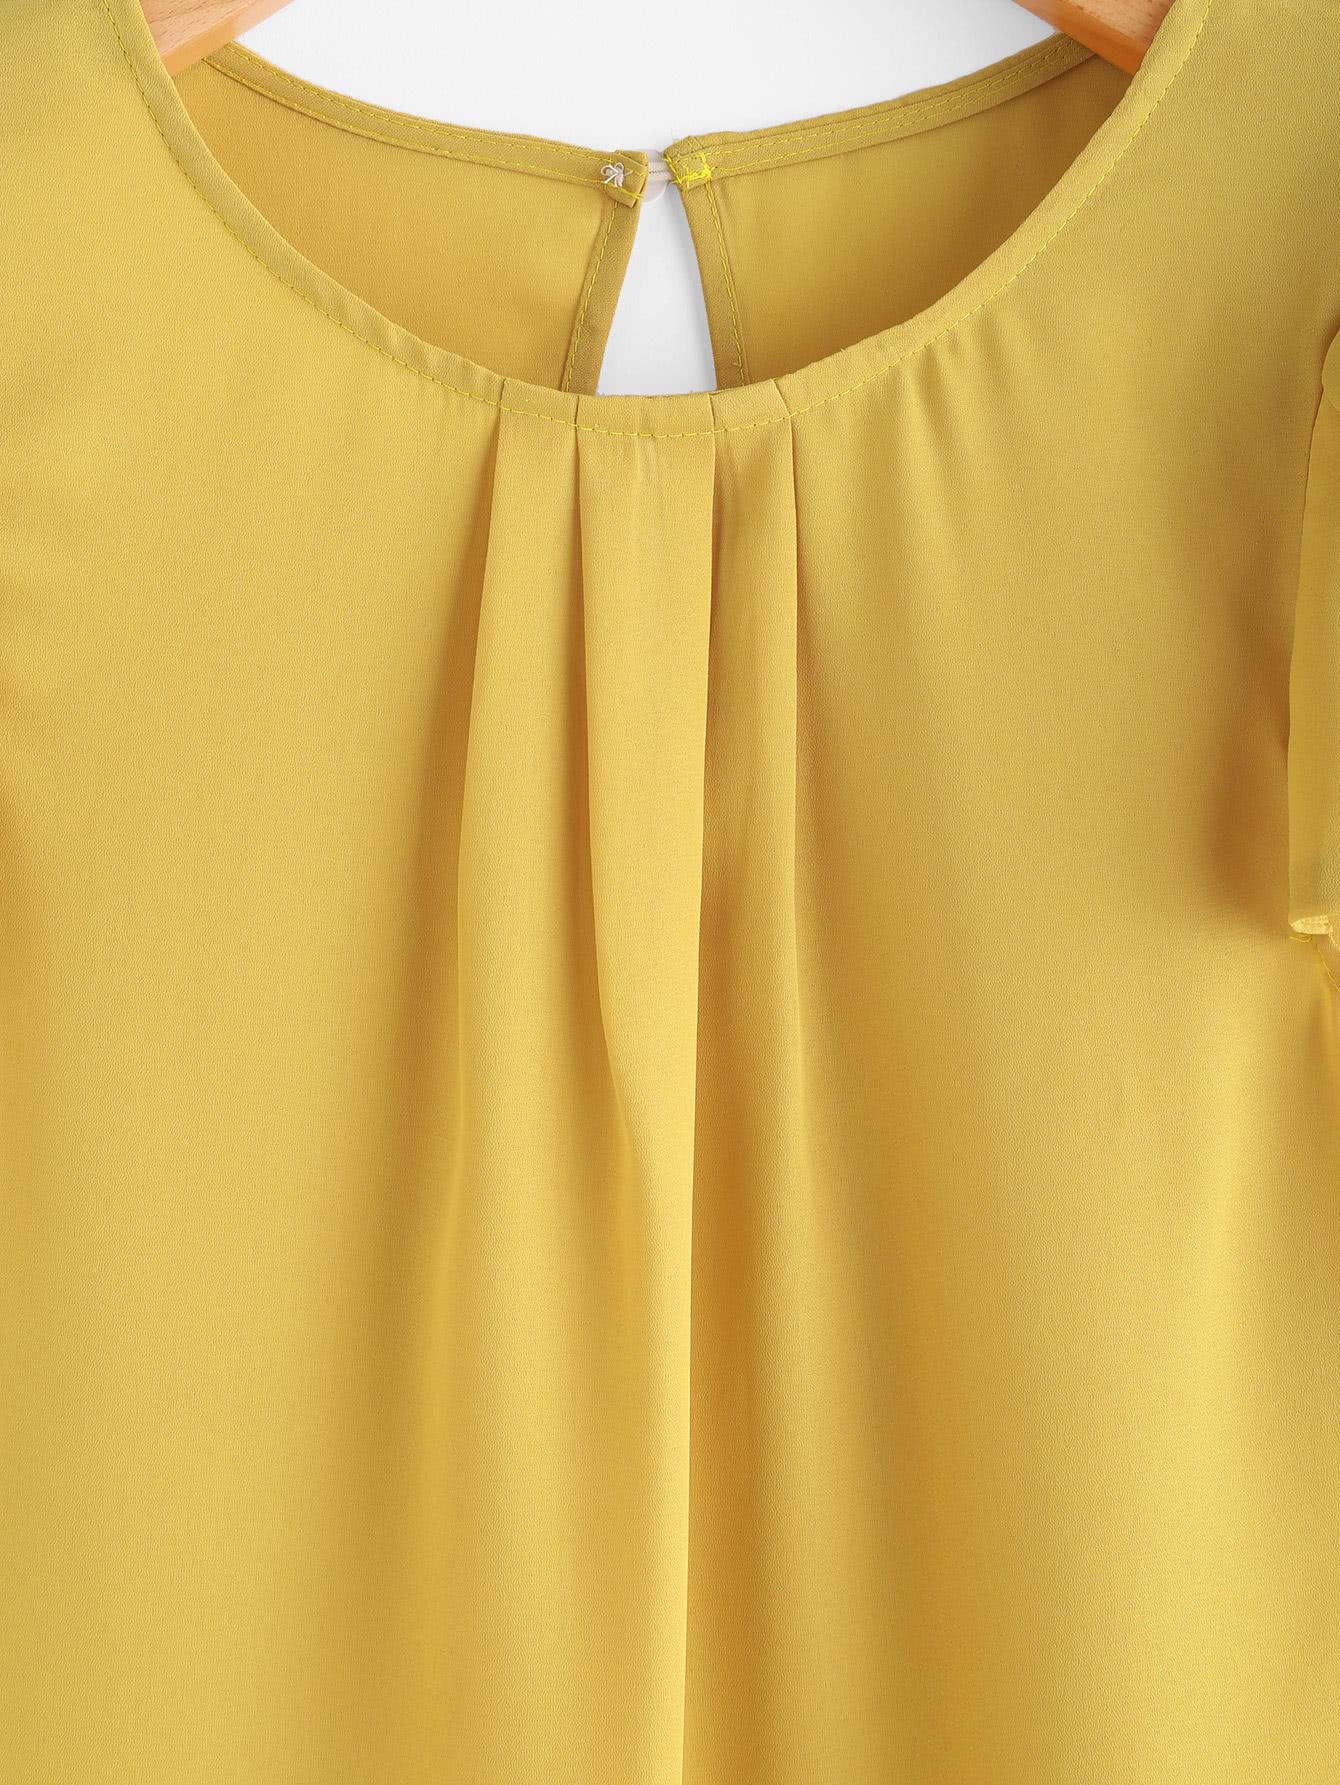 Petal Sleeve Keyhole Back Curved Hem Blouse